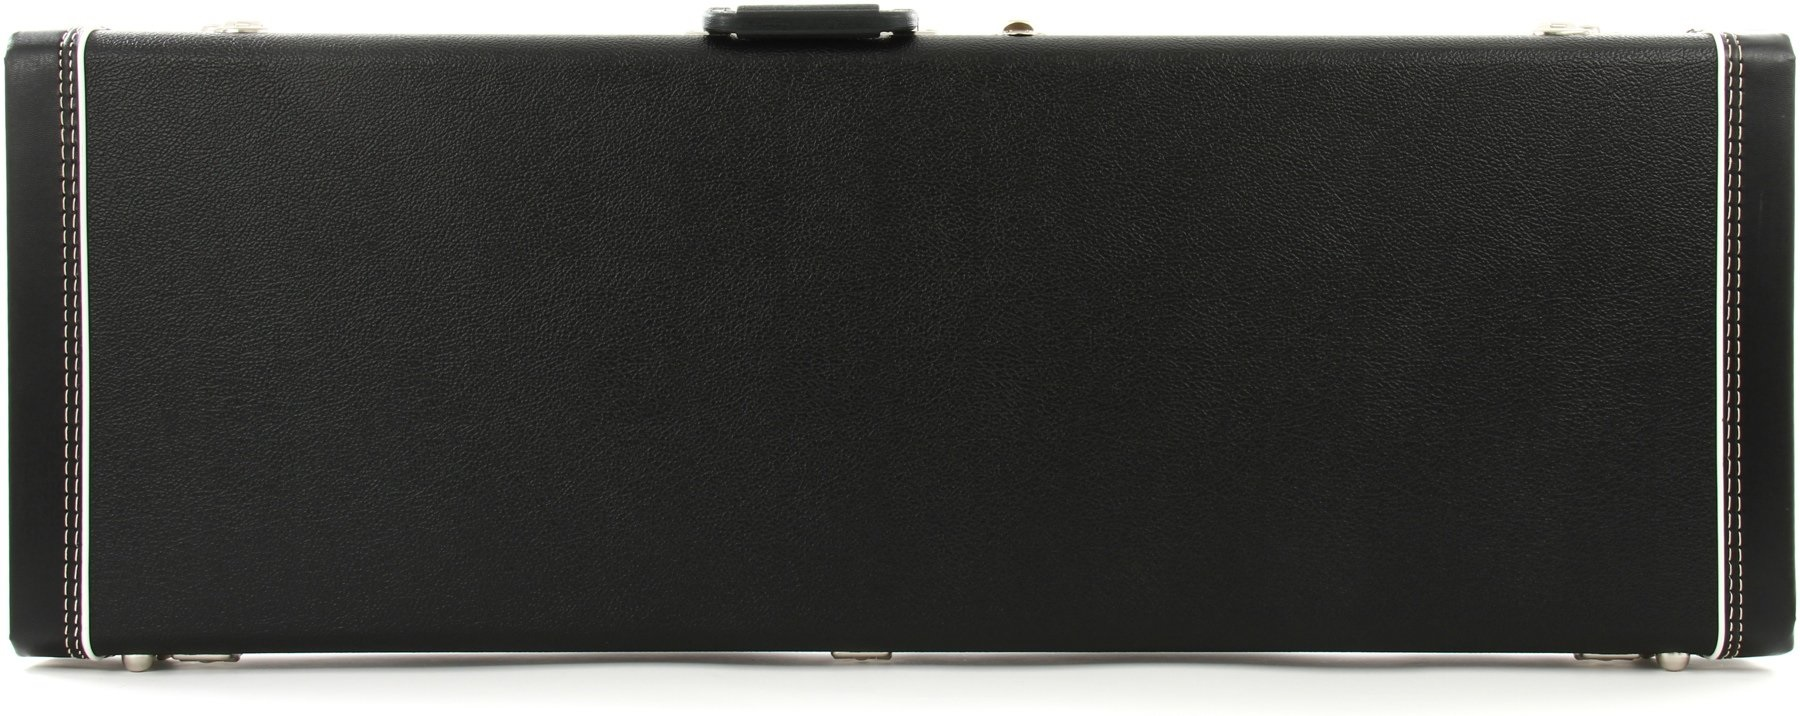 Fender Standard Case, Black w/ Black Acrylic Interior